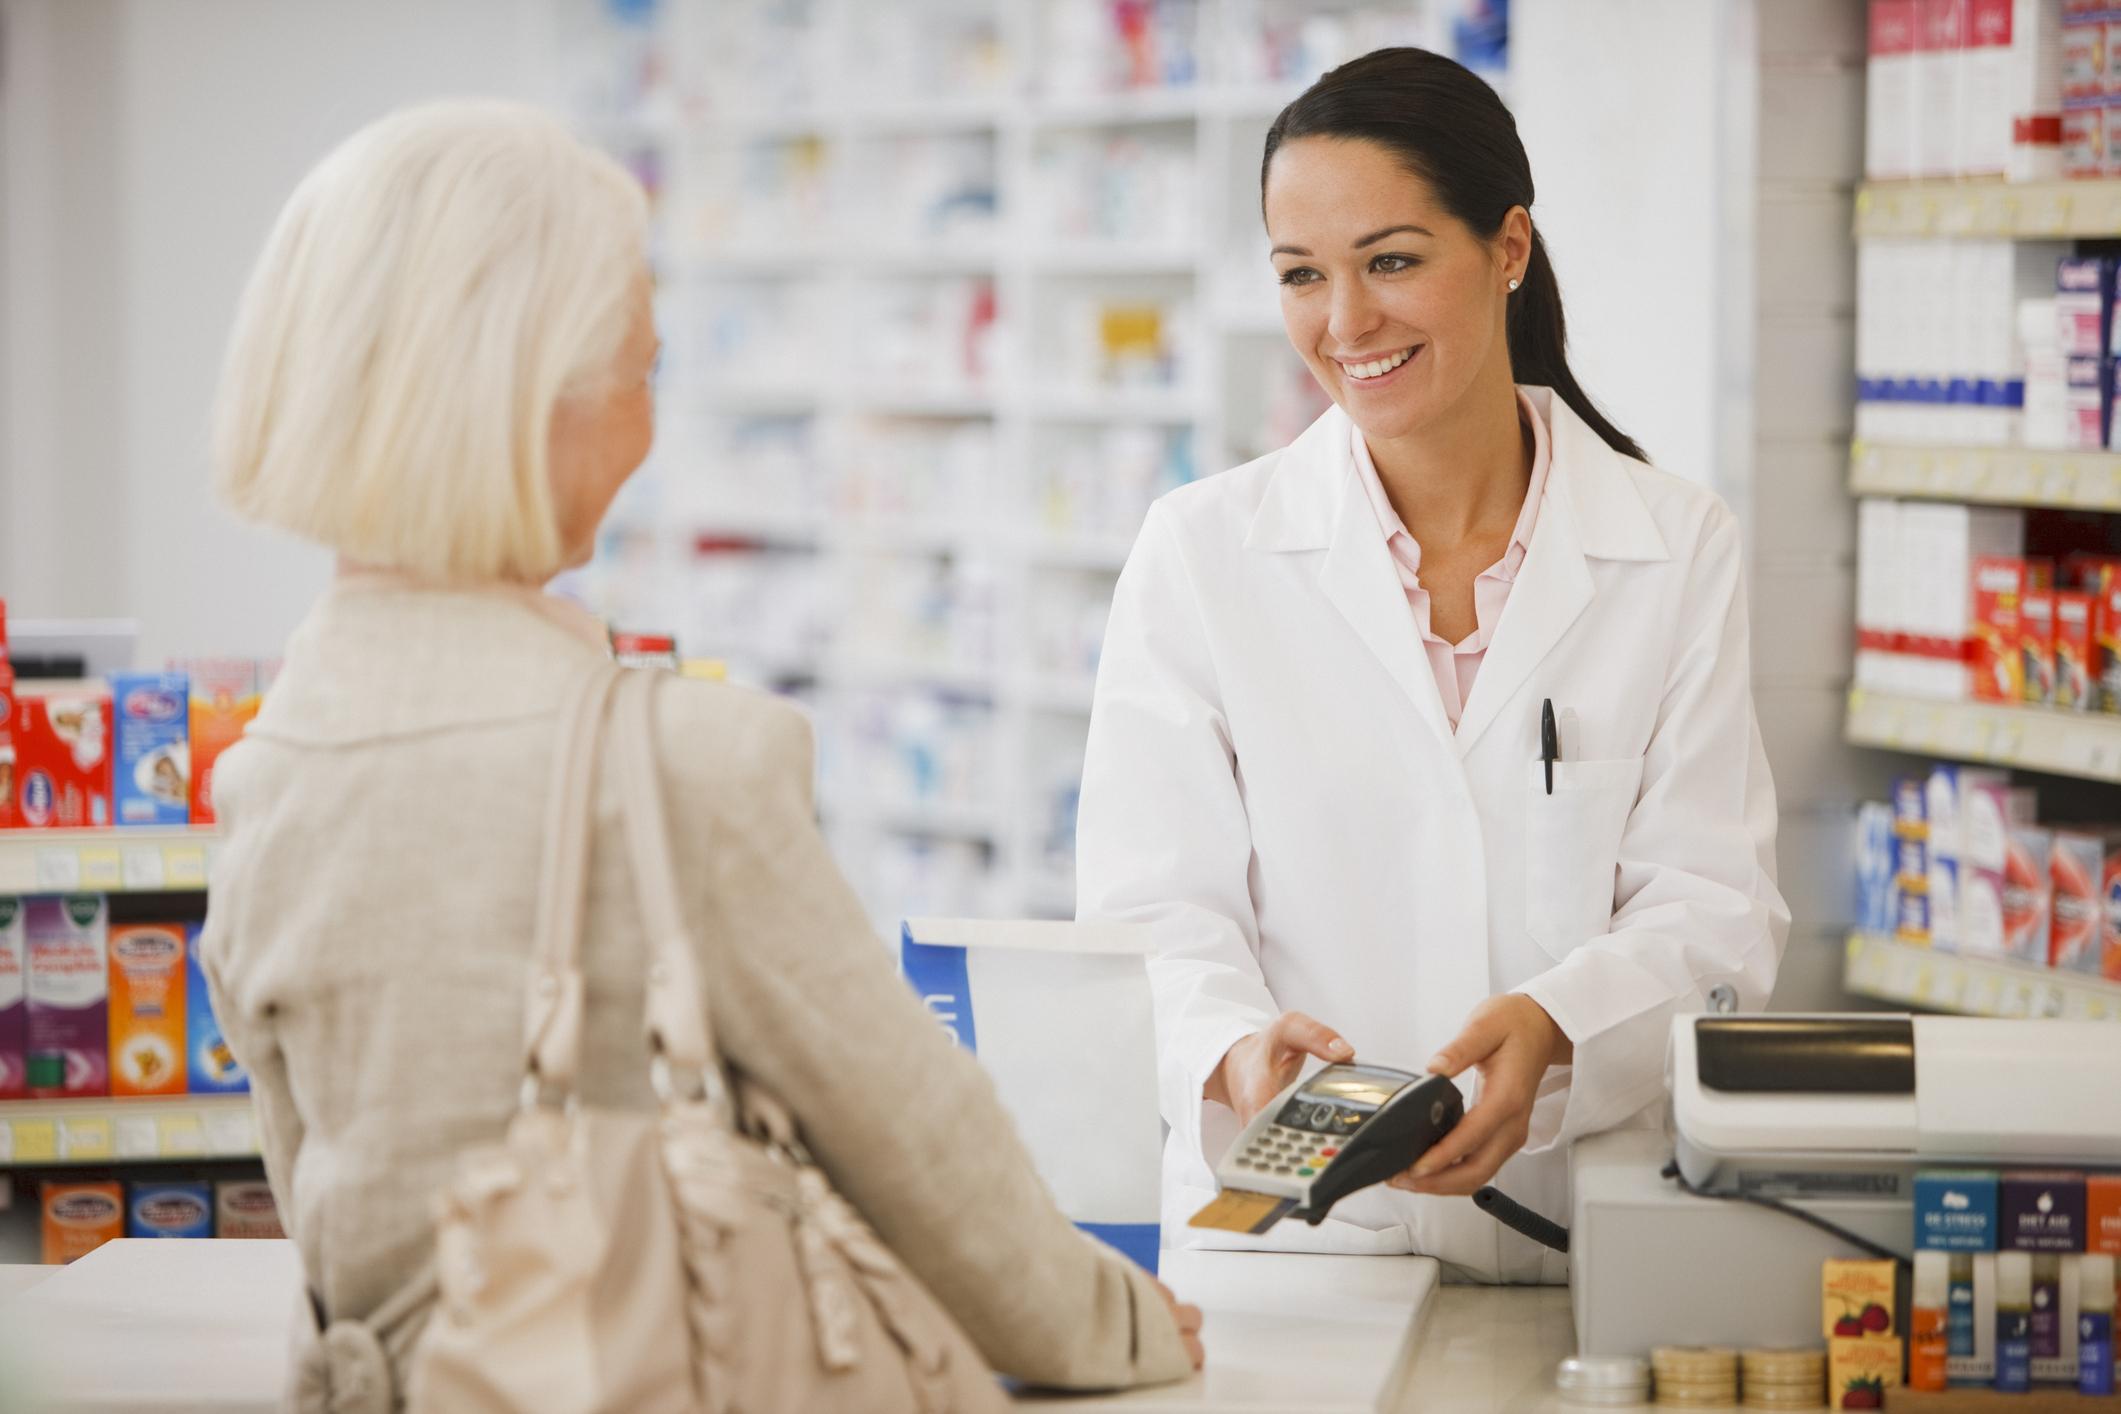 A smiling female pharmacist across the counter from female customer in drugstore